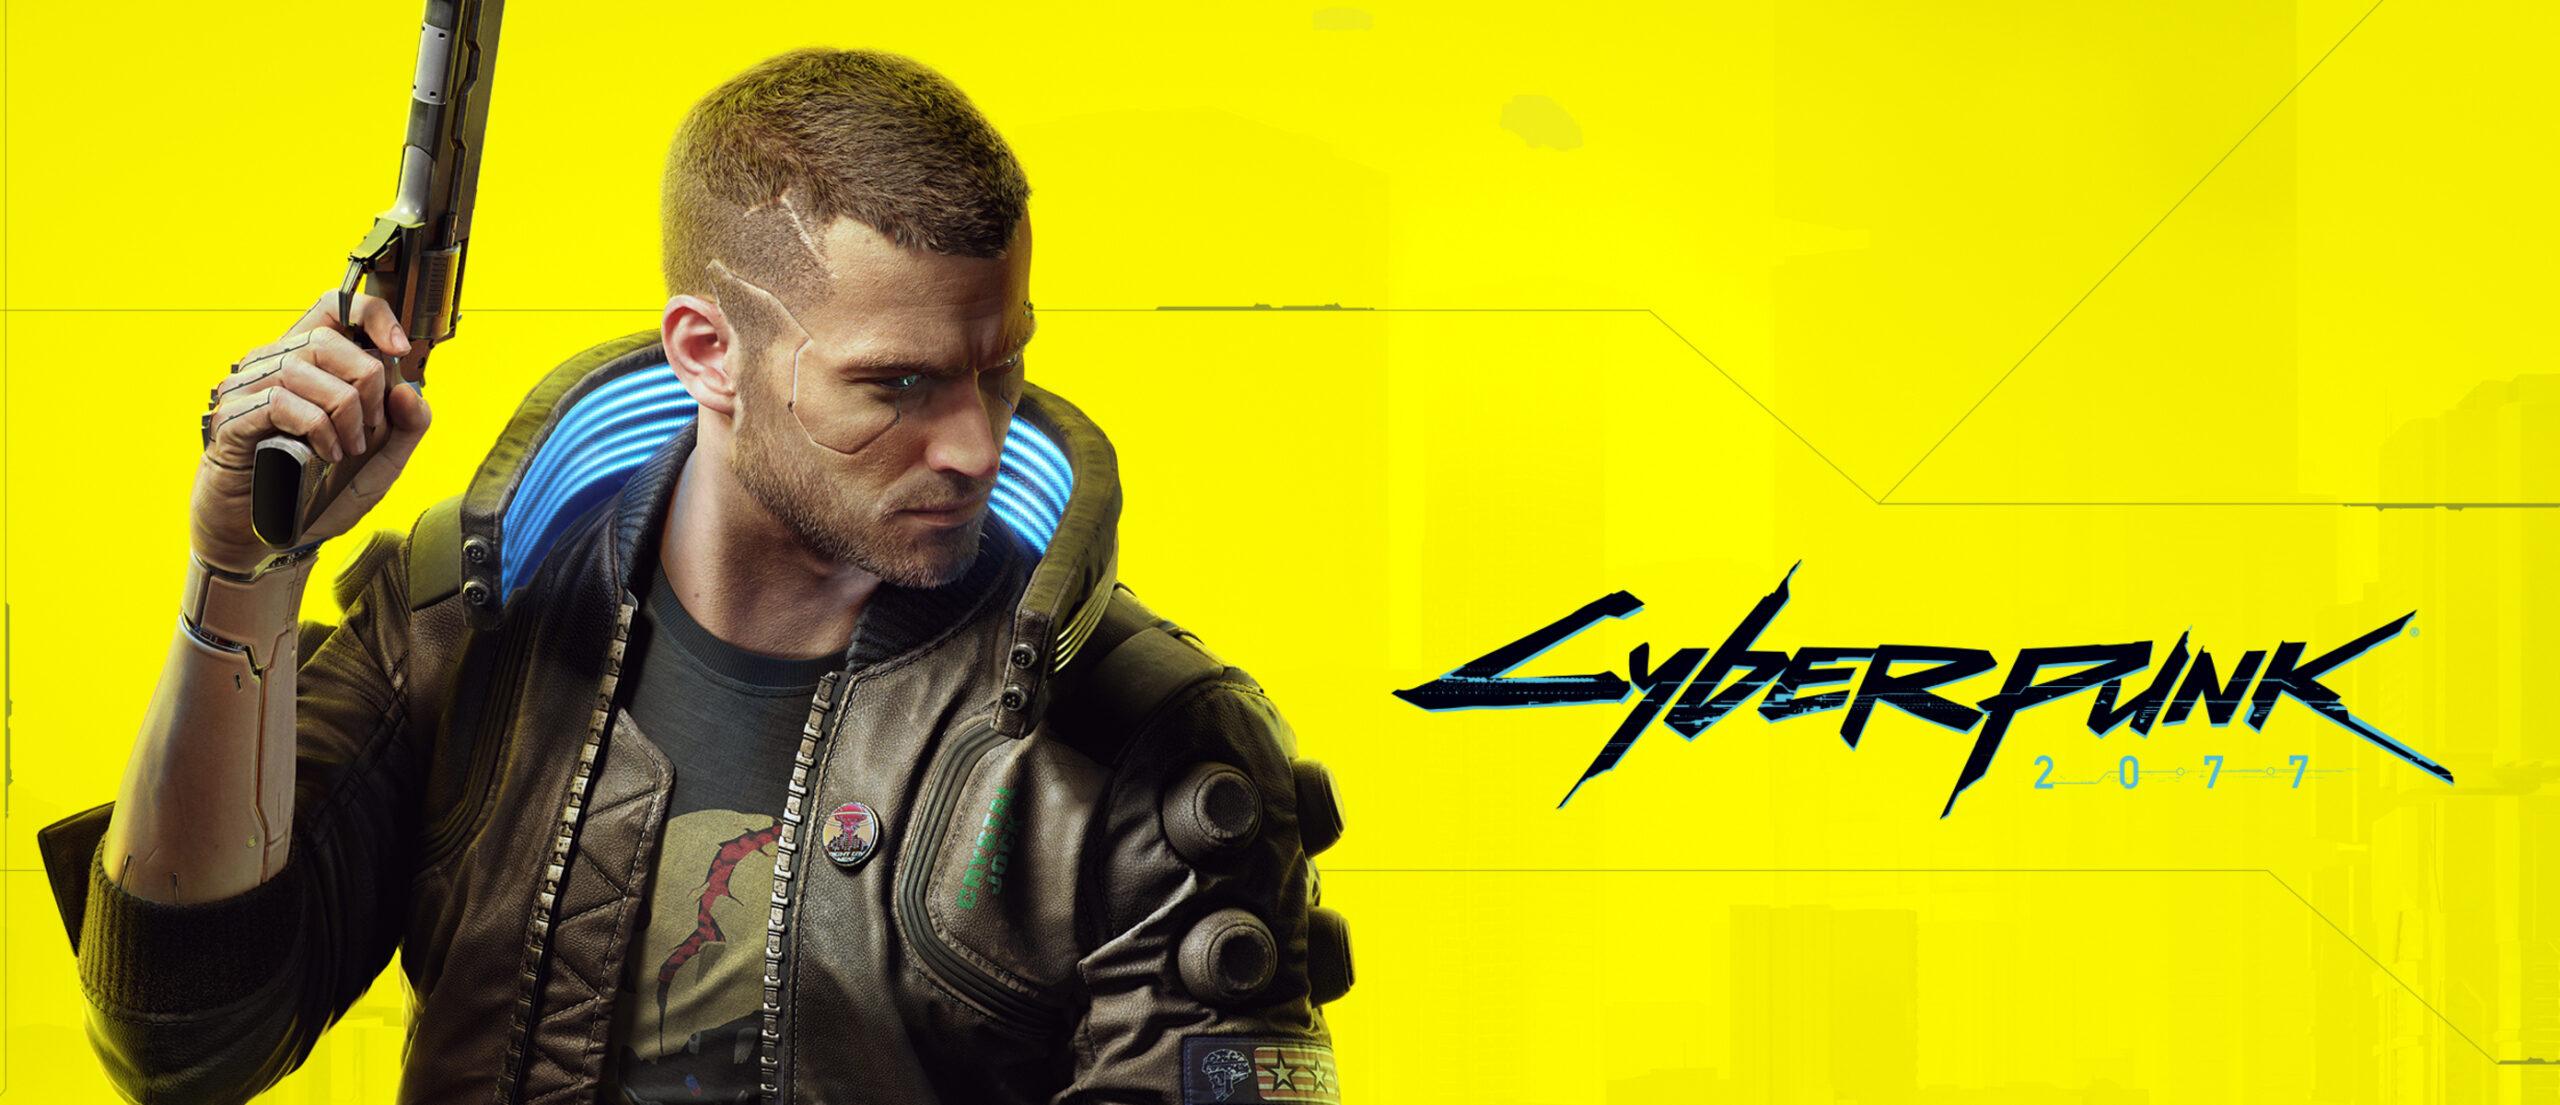 Арт игры Cyberpunk 2077